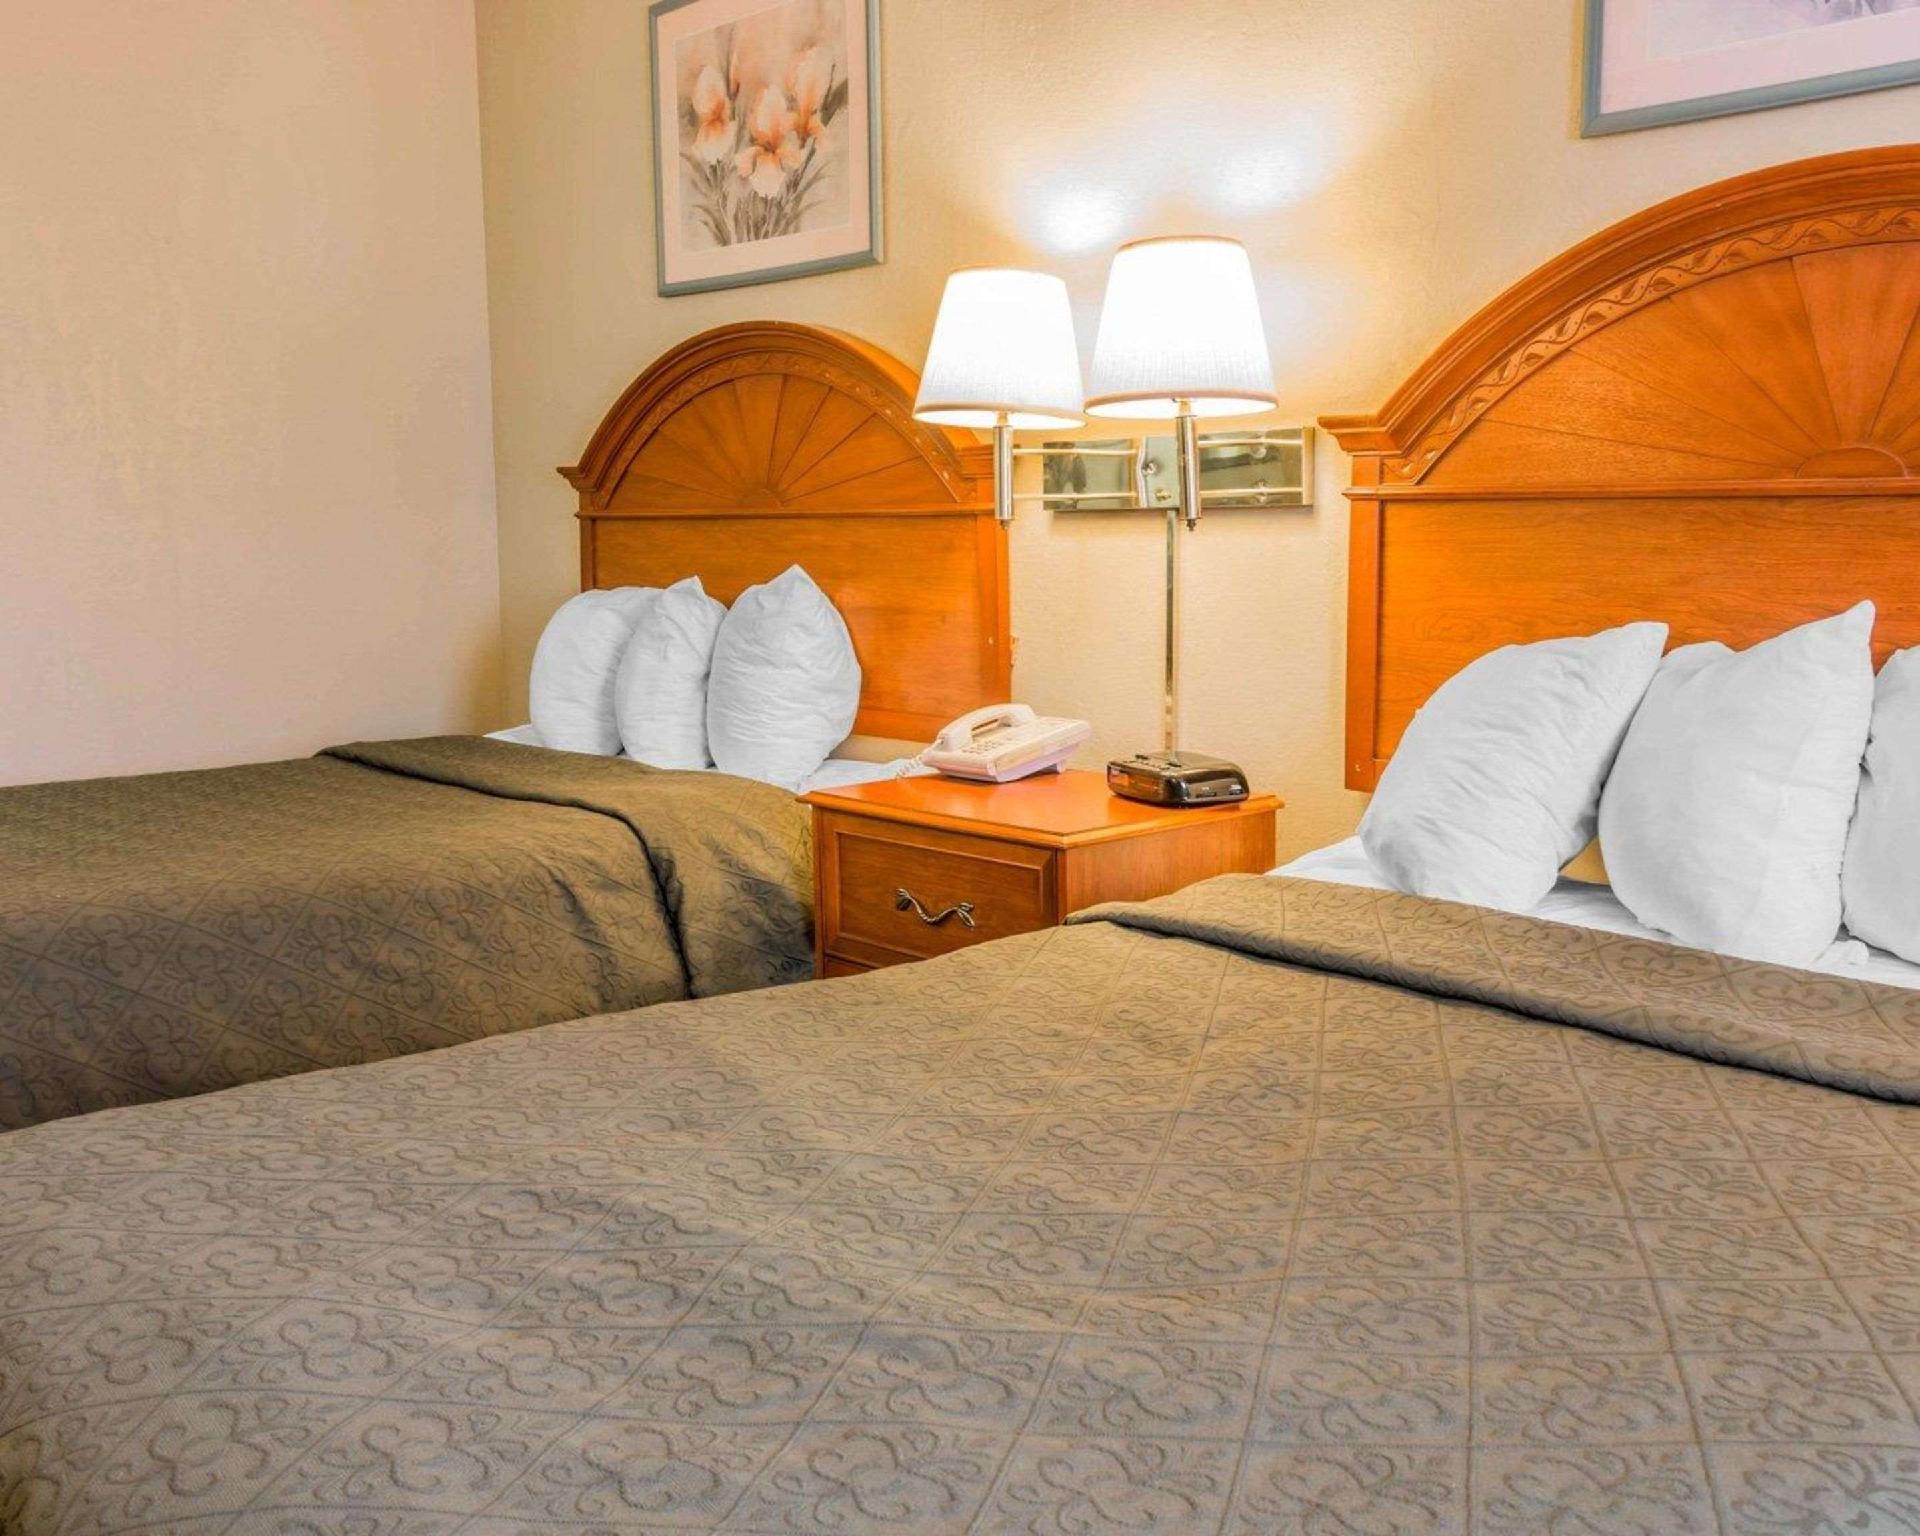 Quality Inn Grand Rapids North Hotel (Grand Rapids (MI)) - Deals, Photos &  Reviews